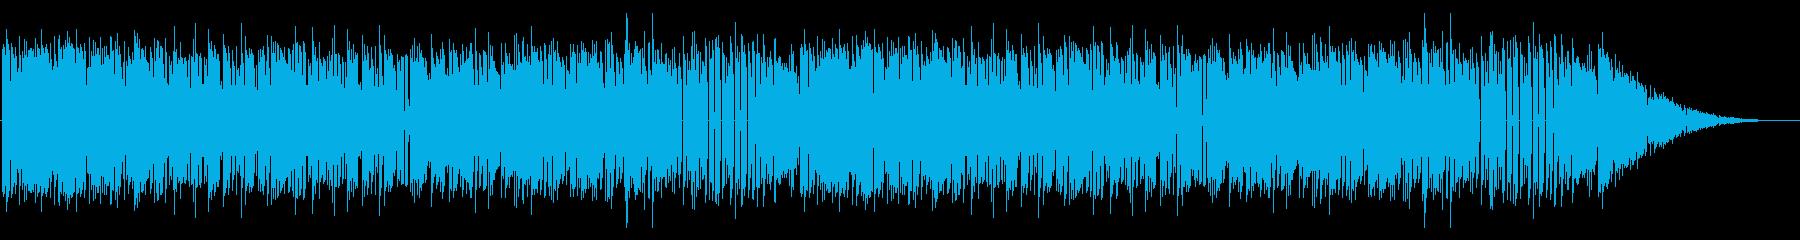 NES アクションC04-1(ステージ2の再生済みの波形